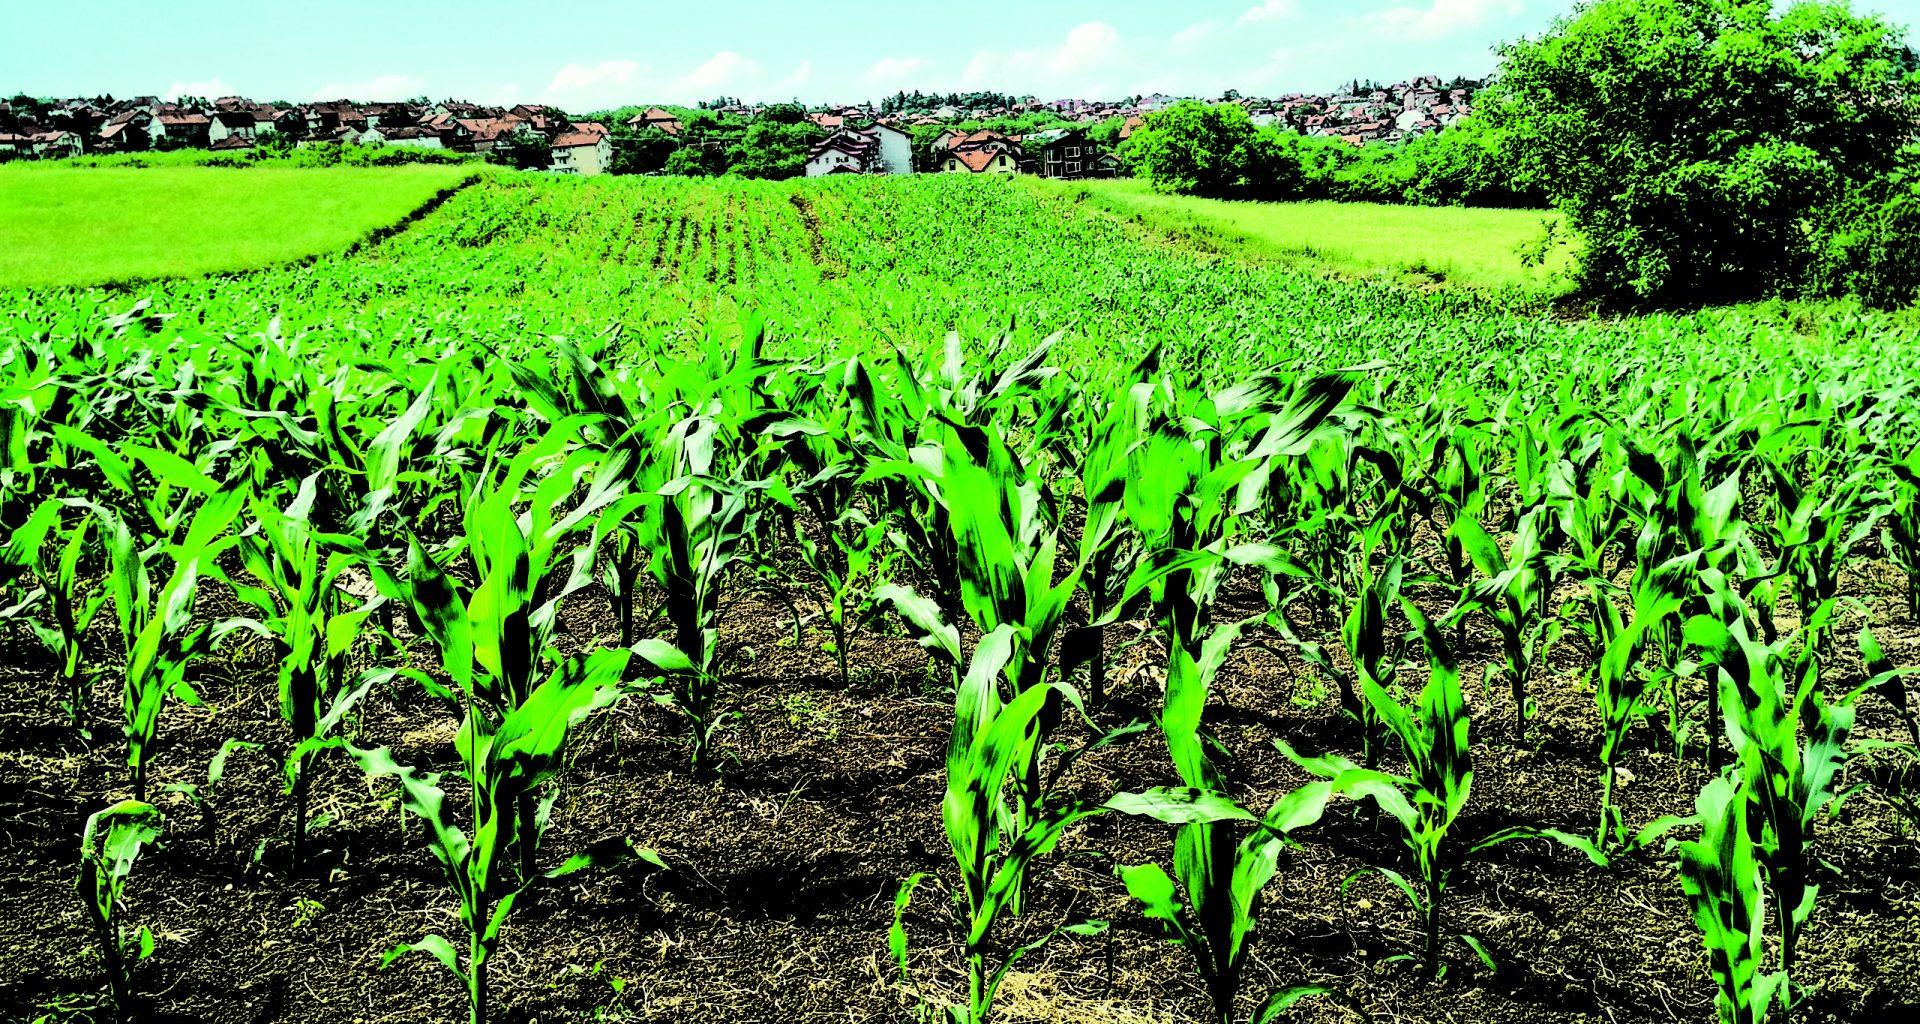 corn-plant-on-field-1112080